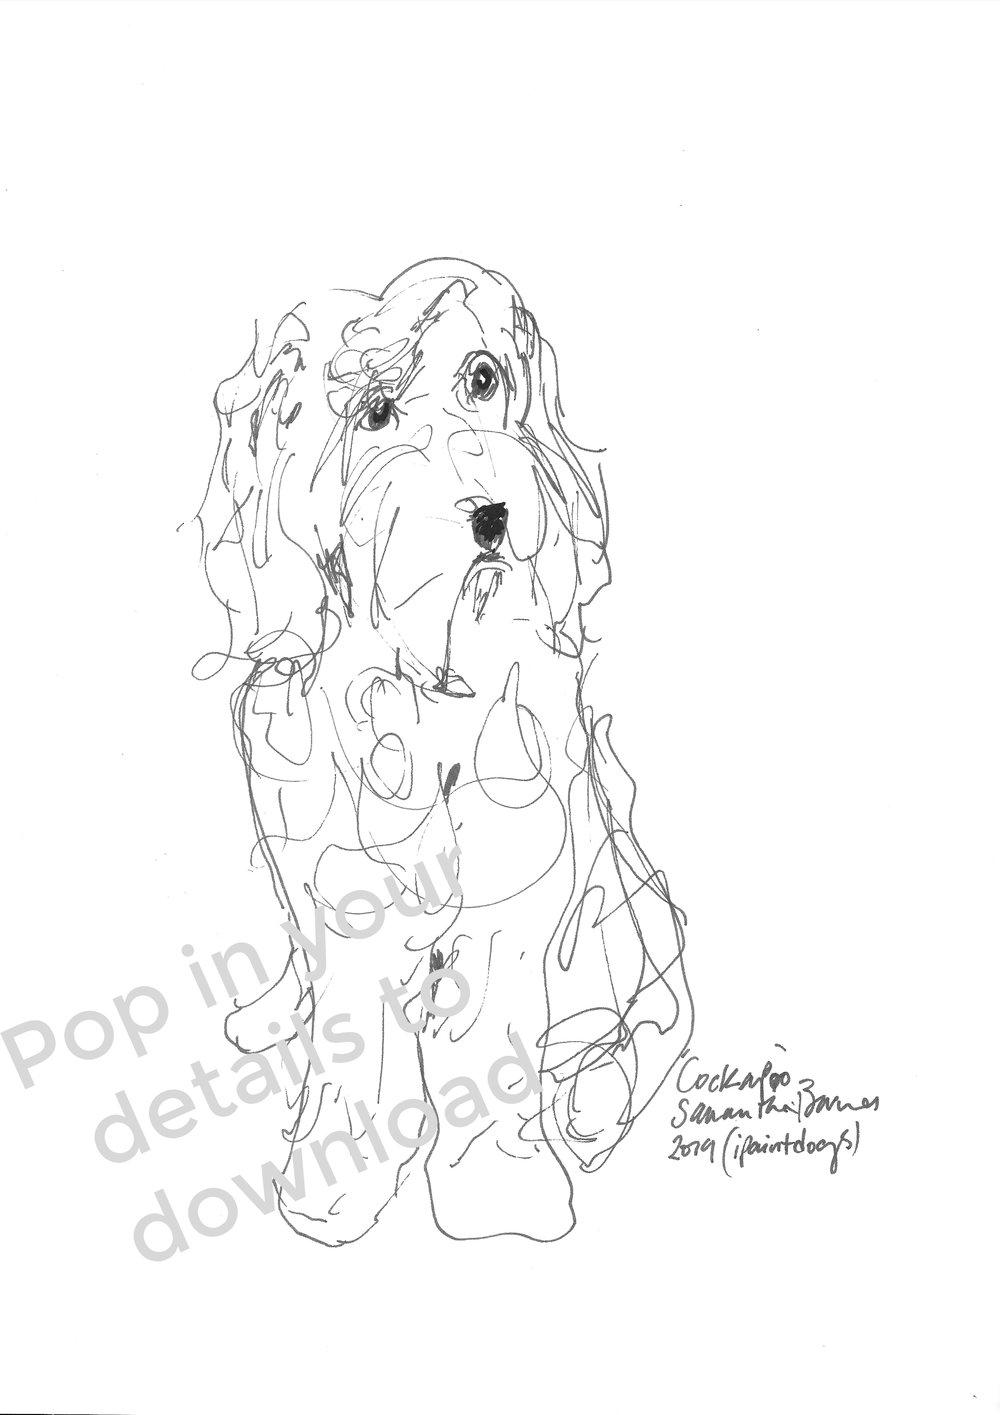 Cockapoo Line Drawing by Samantha Barnes, ipaintdogs.com Top 3 dogs.jpg